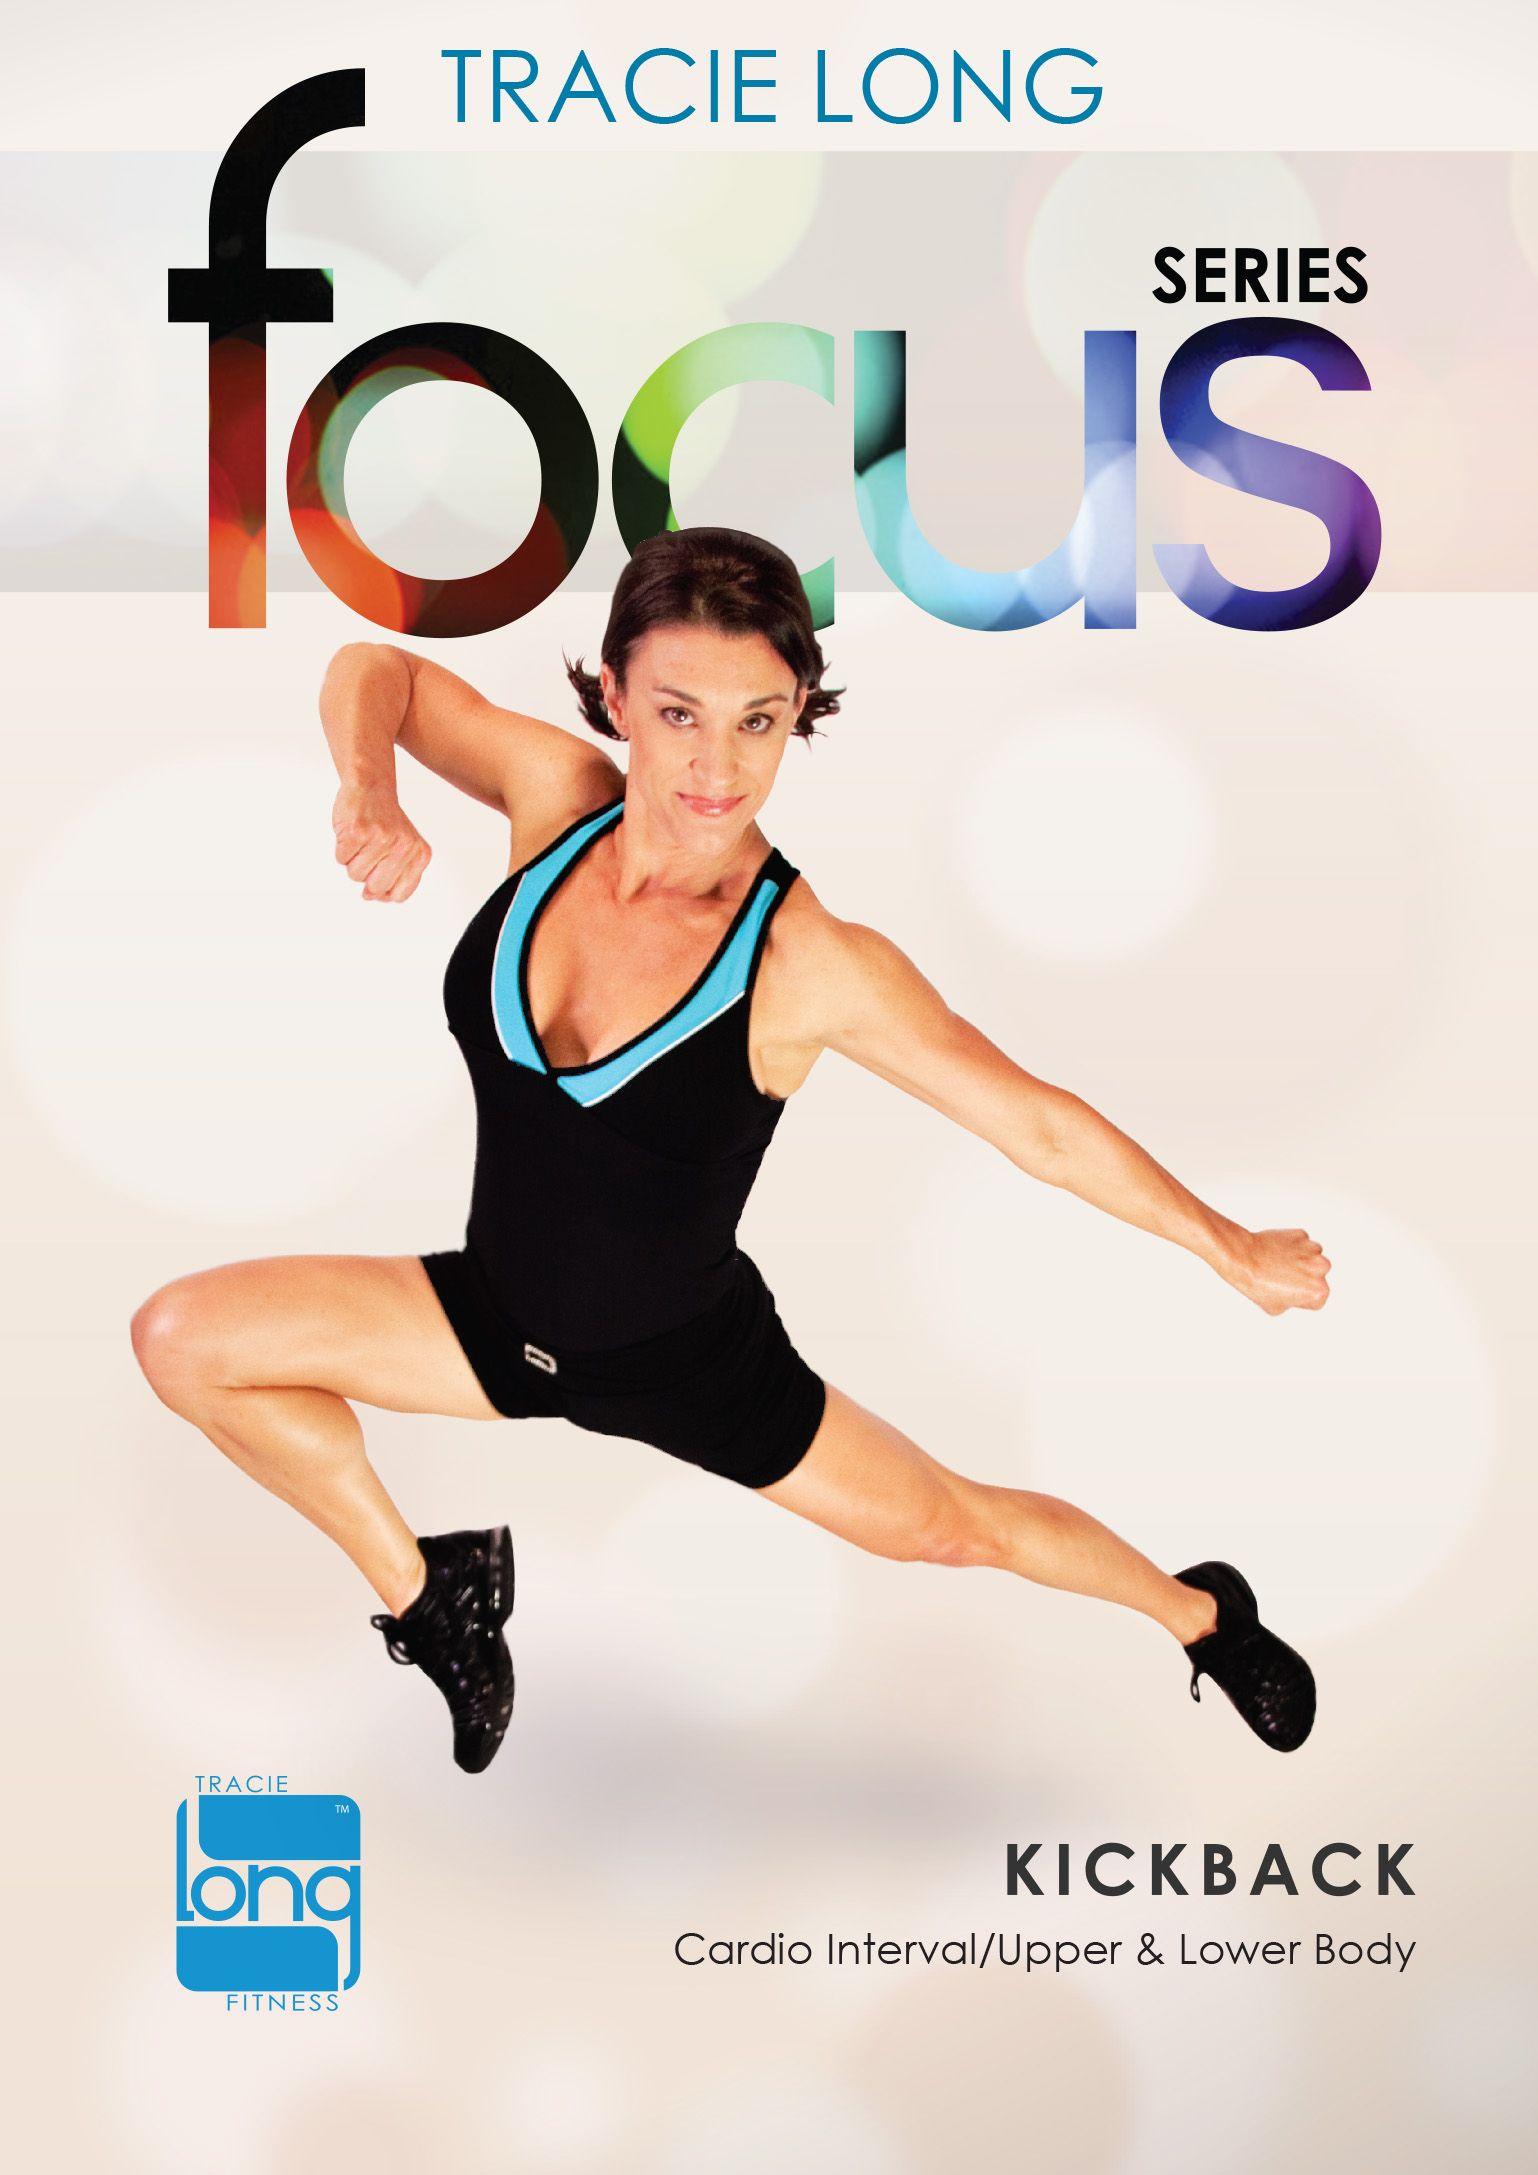 Tracie Long: Focus Series, Vol. 2 - Kickback